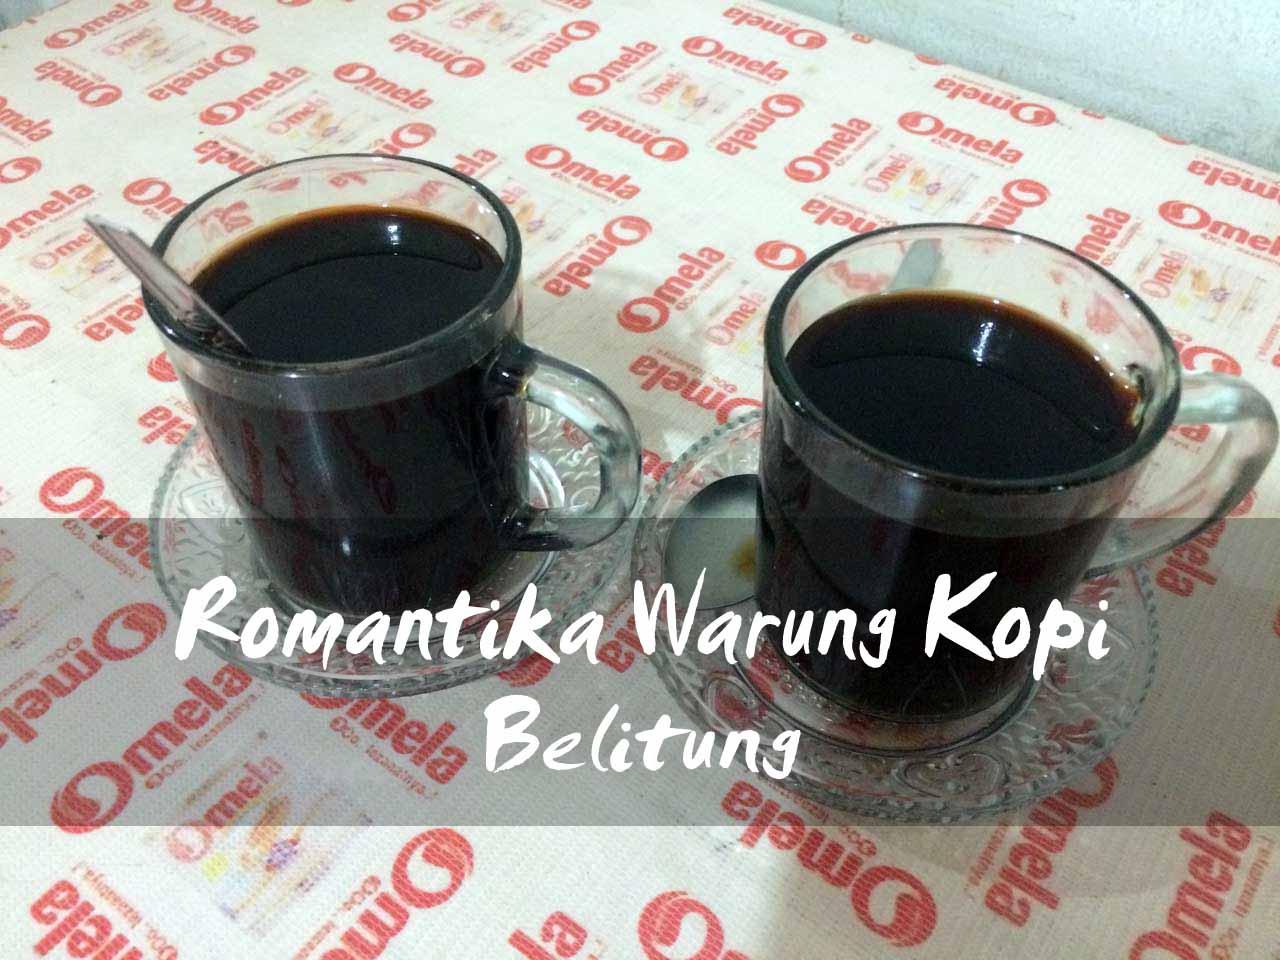 romantika-warung-kopi-belitung